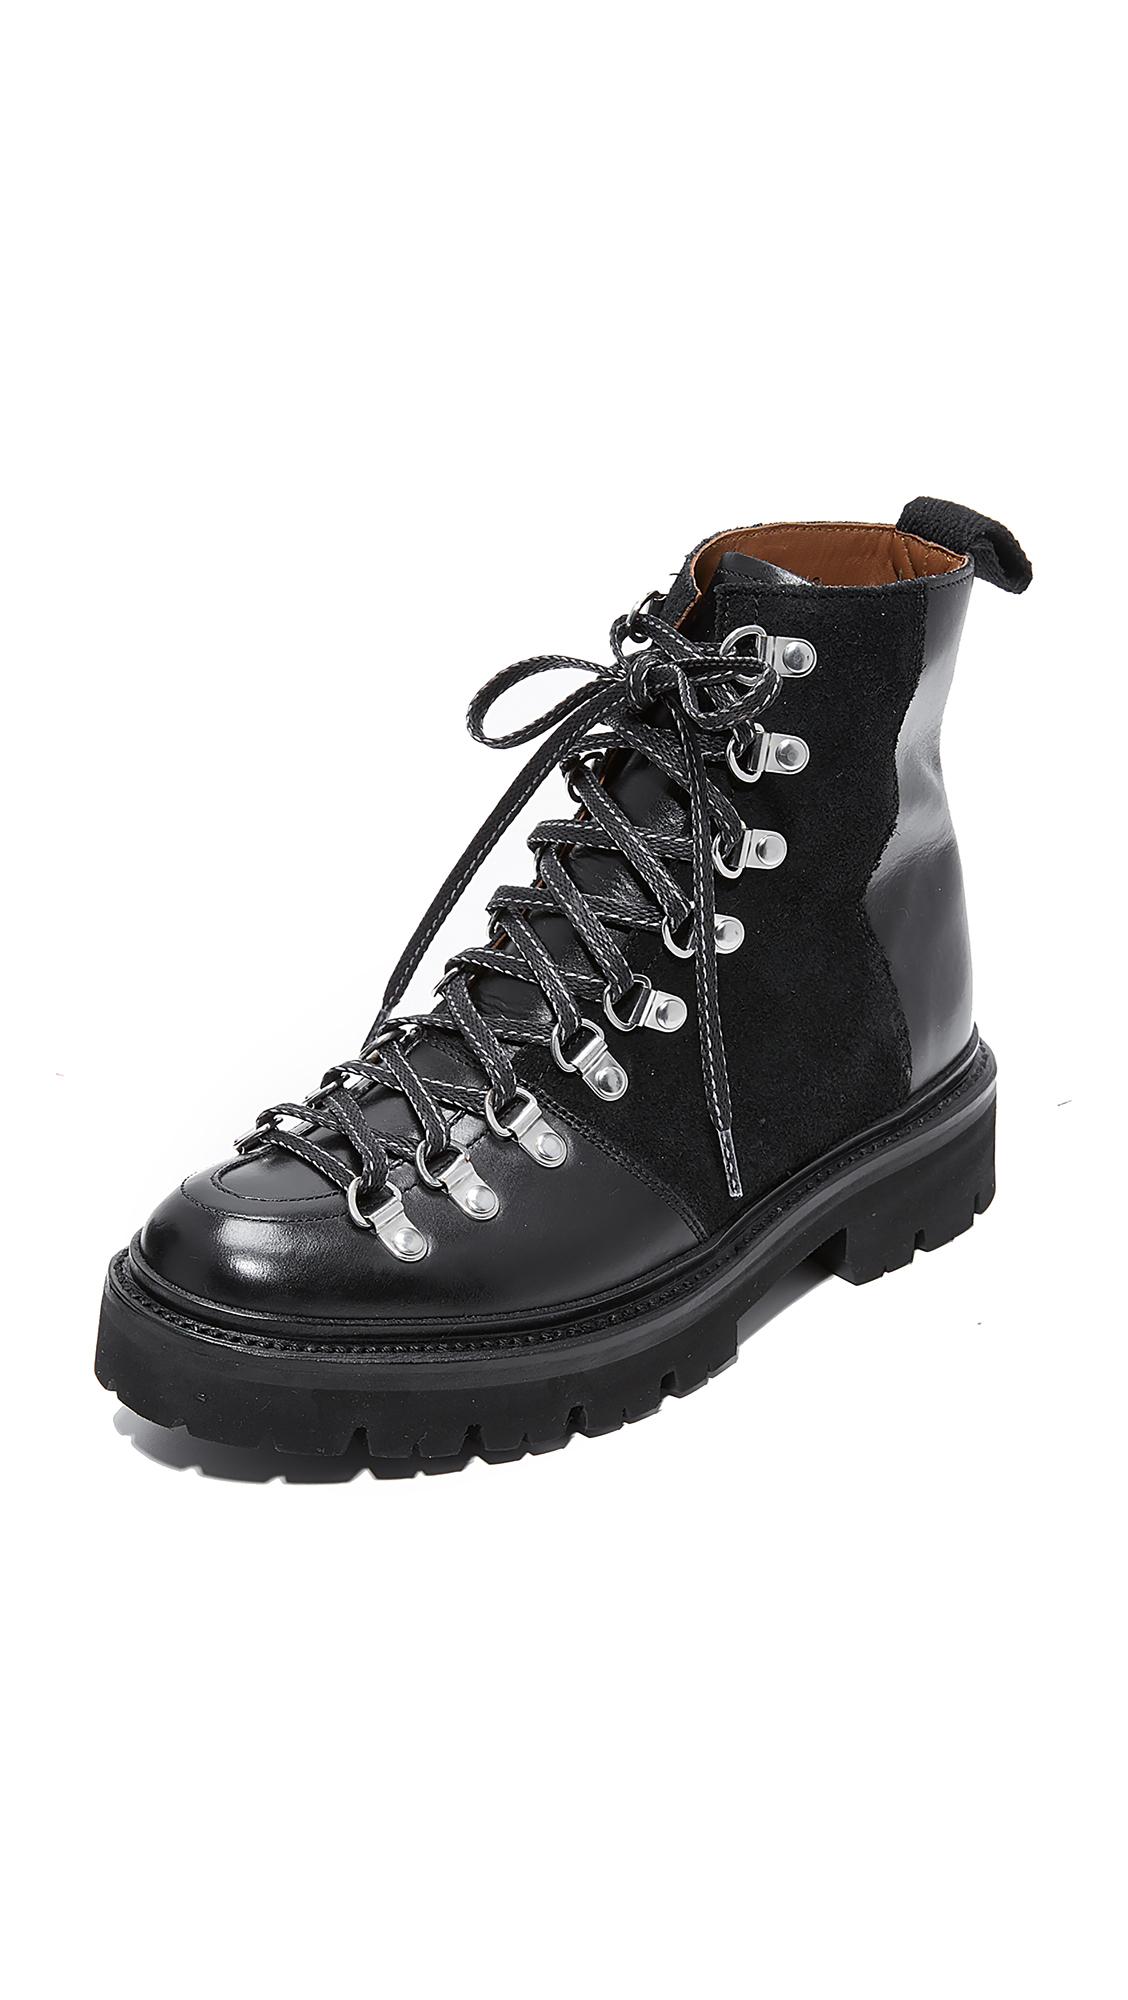 Grenson Nanette Combat Boots - Black